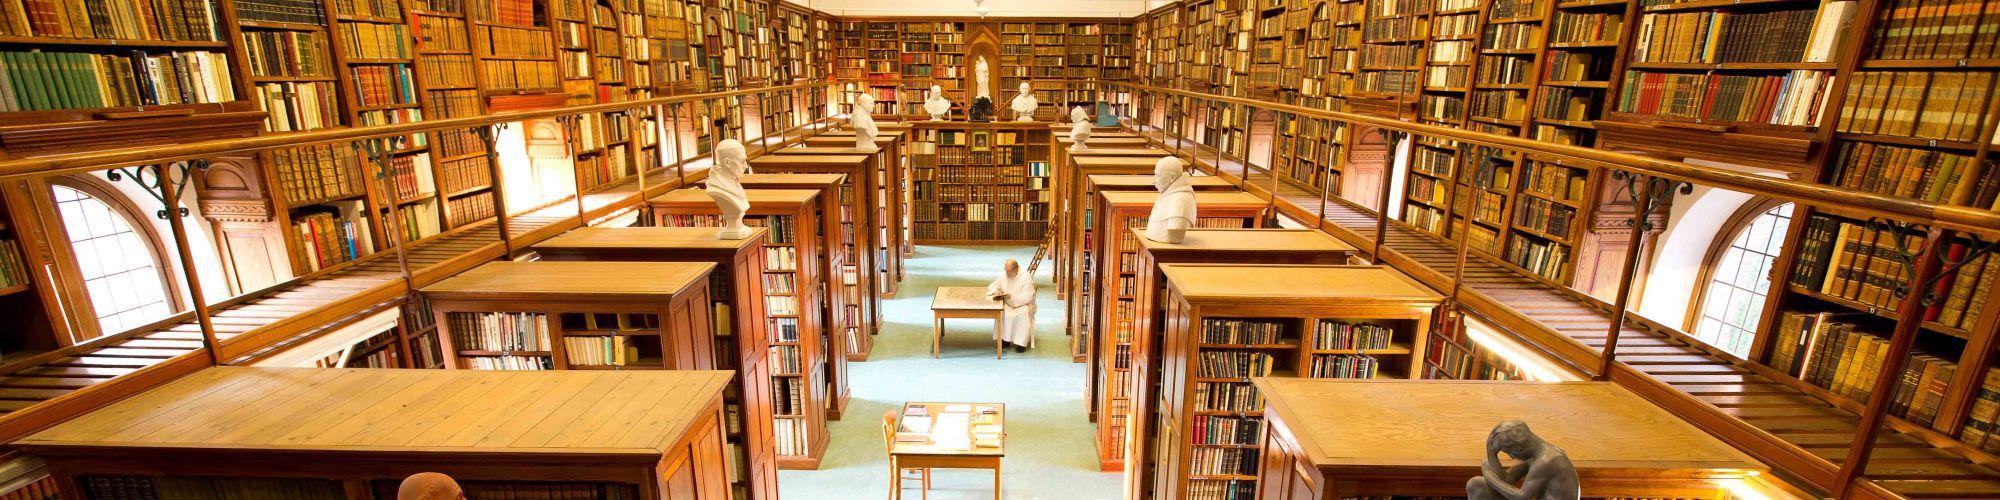 Bibliothèque de l'abbaye de Westmalle, contenant de nombreux manuscrits anciens van Westmalle met veel oude manuscripten